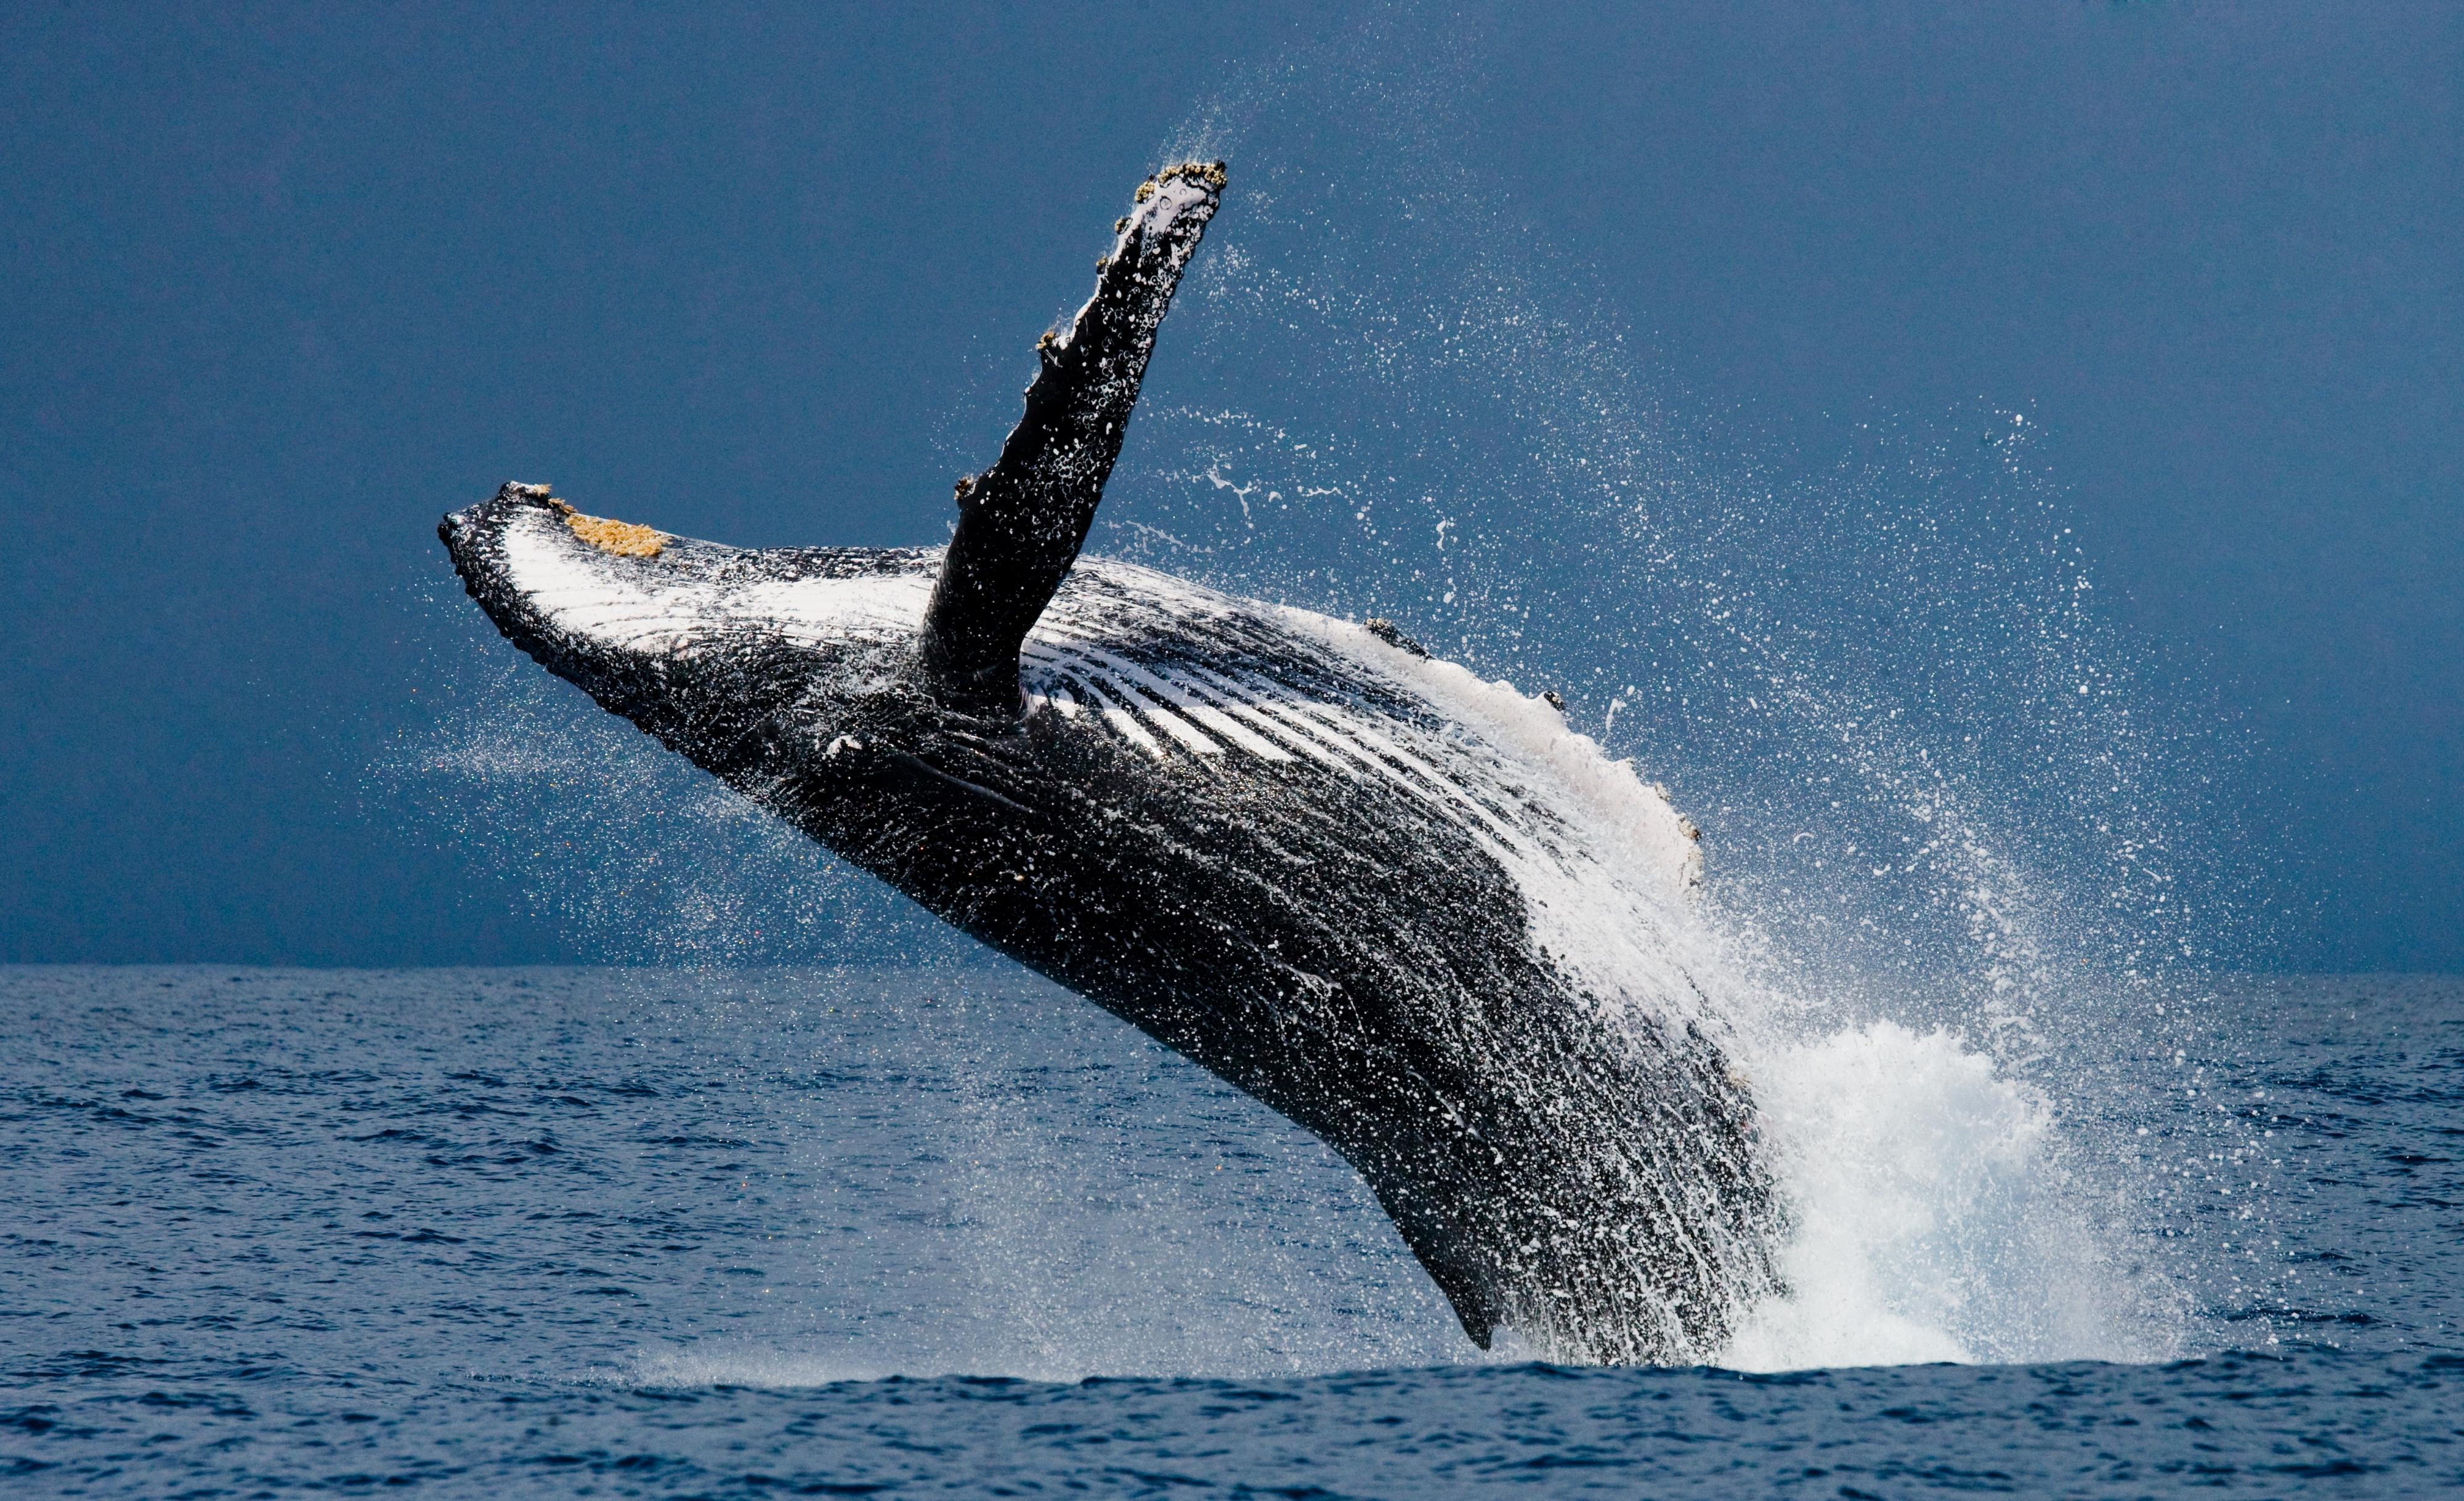 Mirissa Whale Watching in Sri Lanka